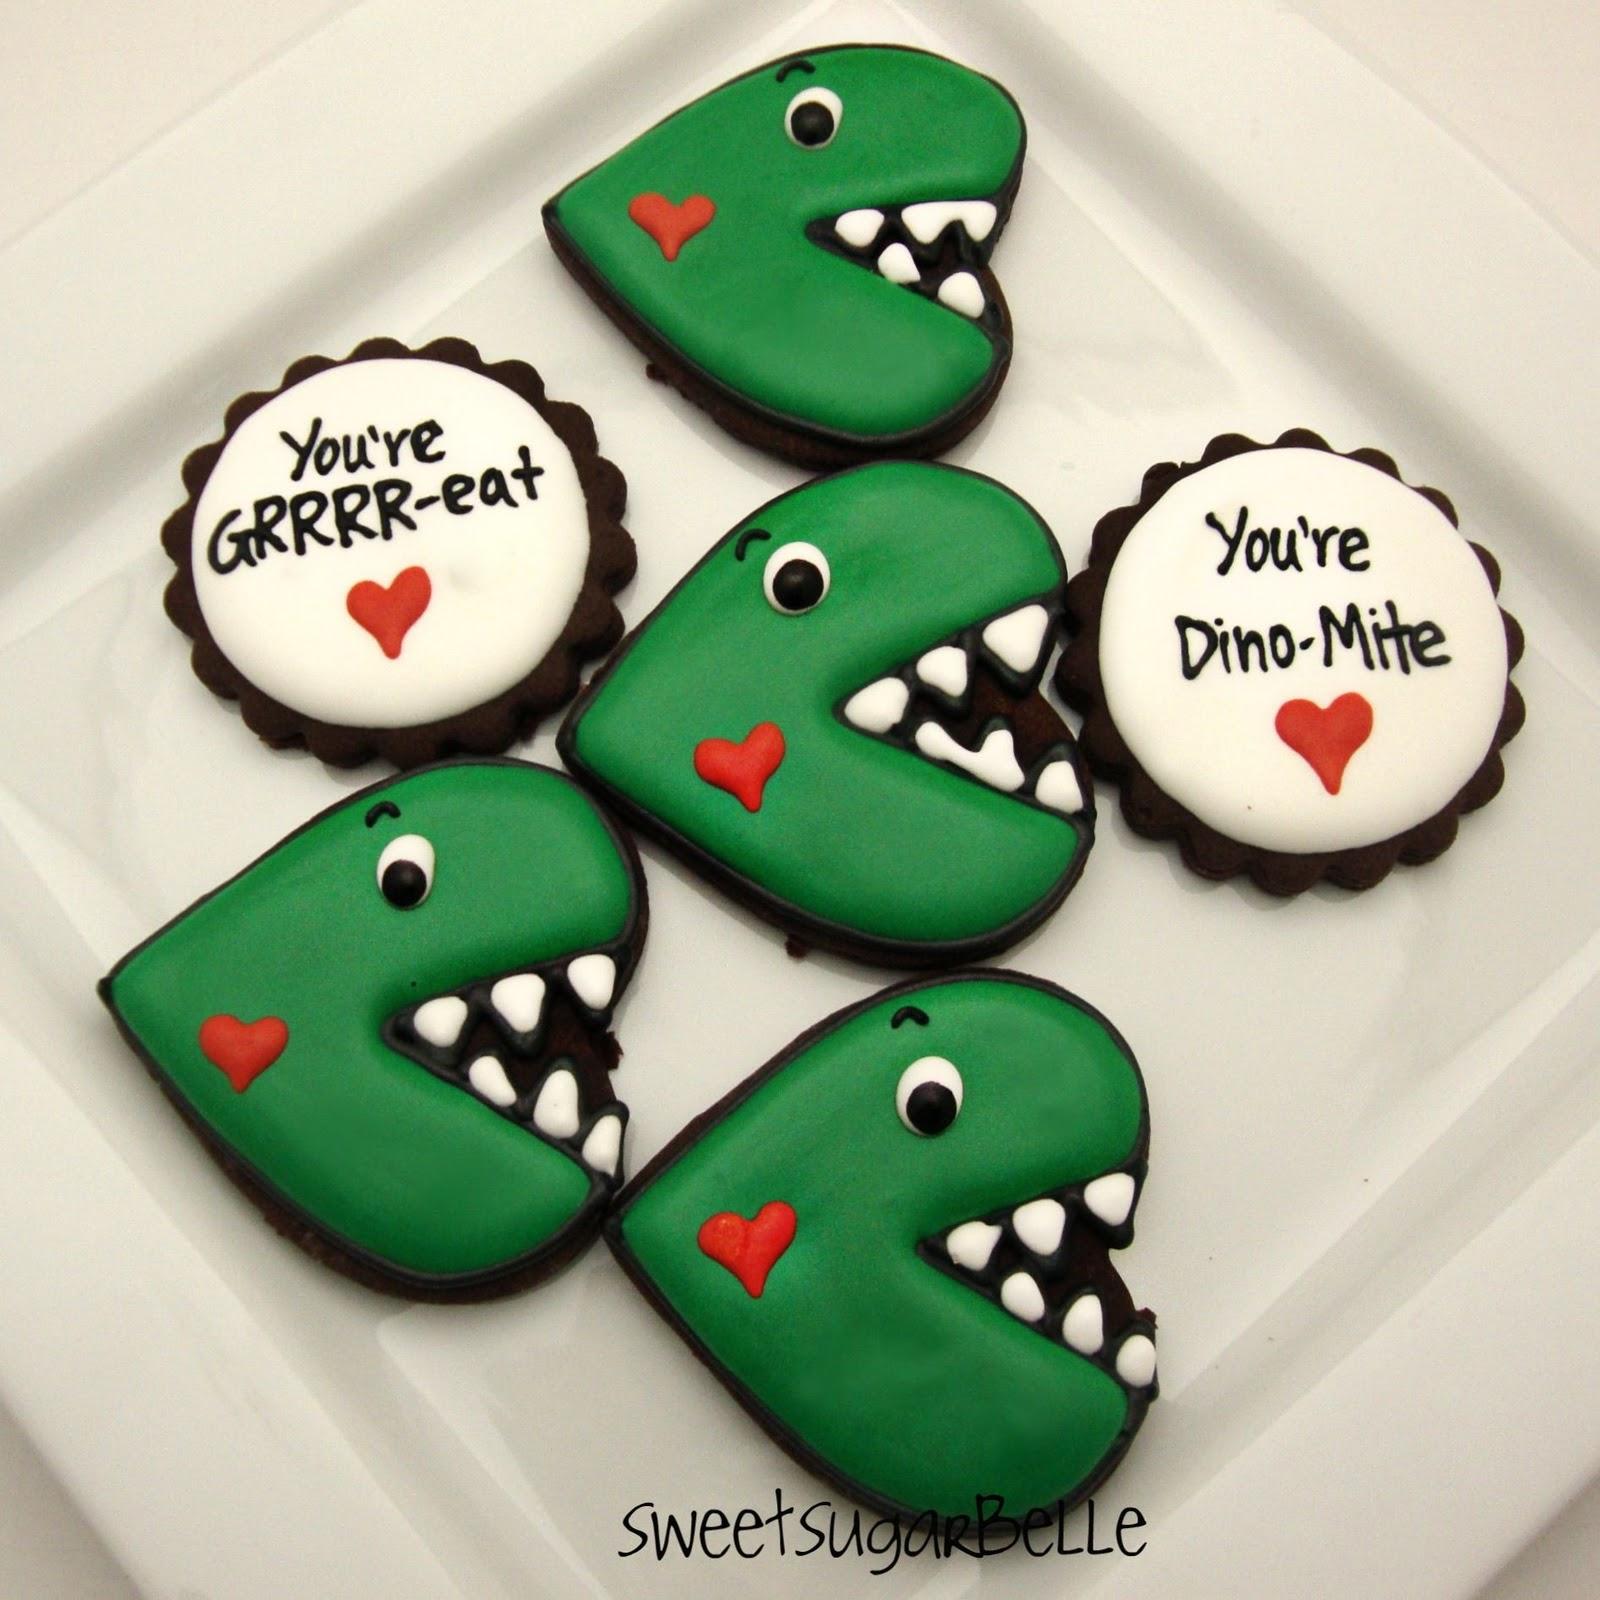 More Grrrrr Eat Valentine S Ideas The Sweet Adventures Of Sugar Belle